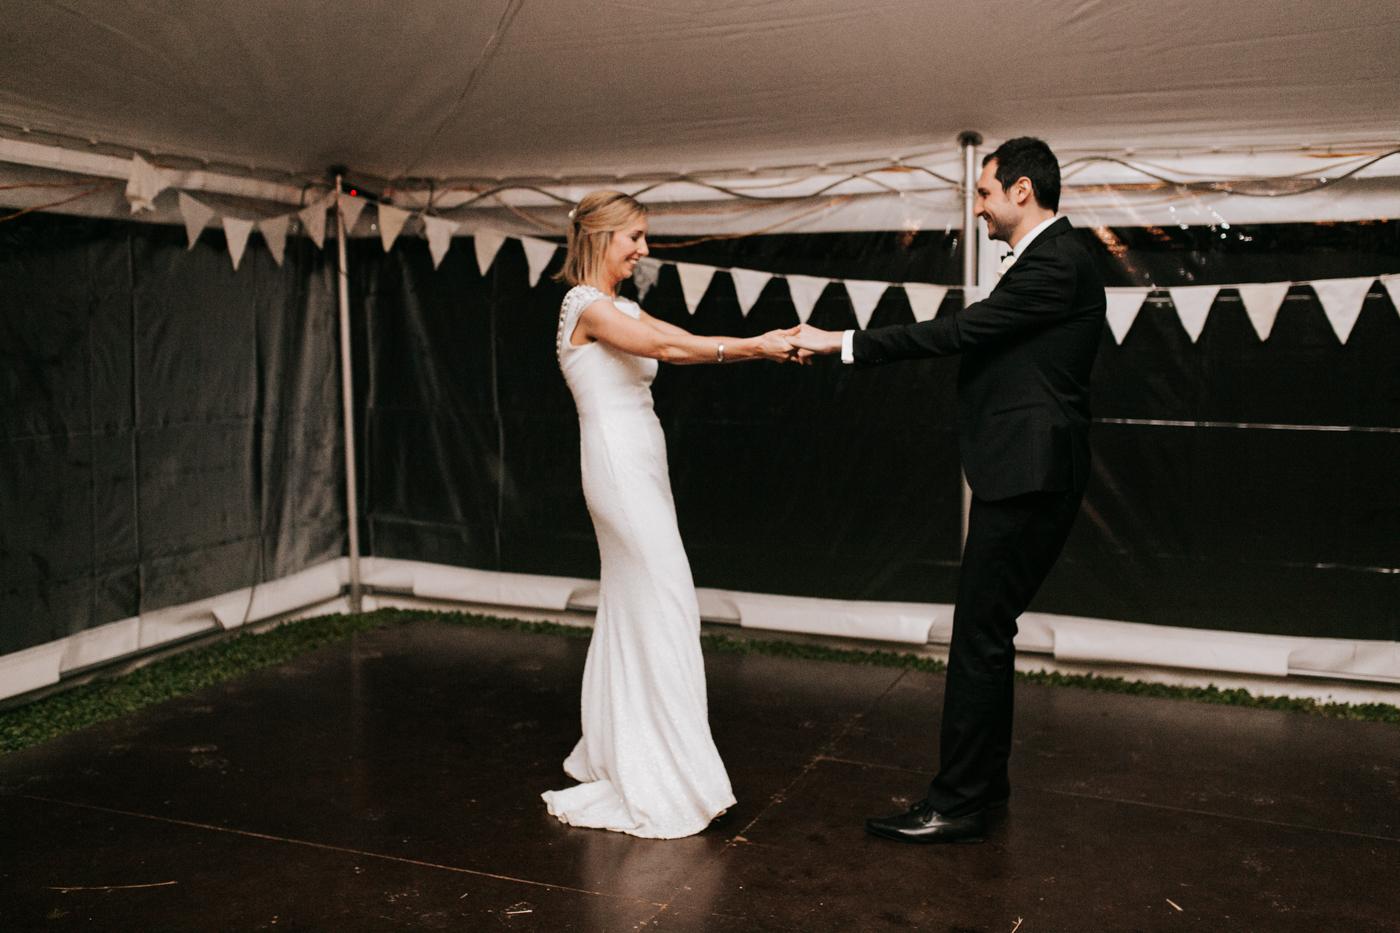 Bridget & James - Orange Country Wedding - Samantha Heather Photography-268.jpg